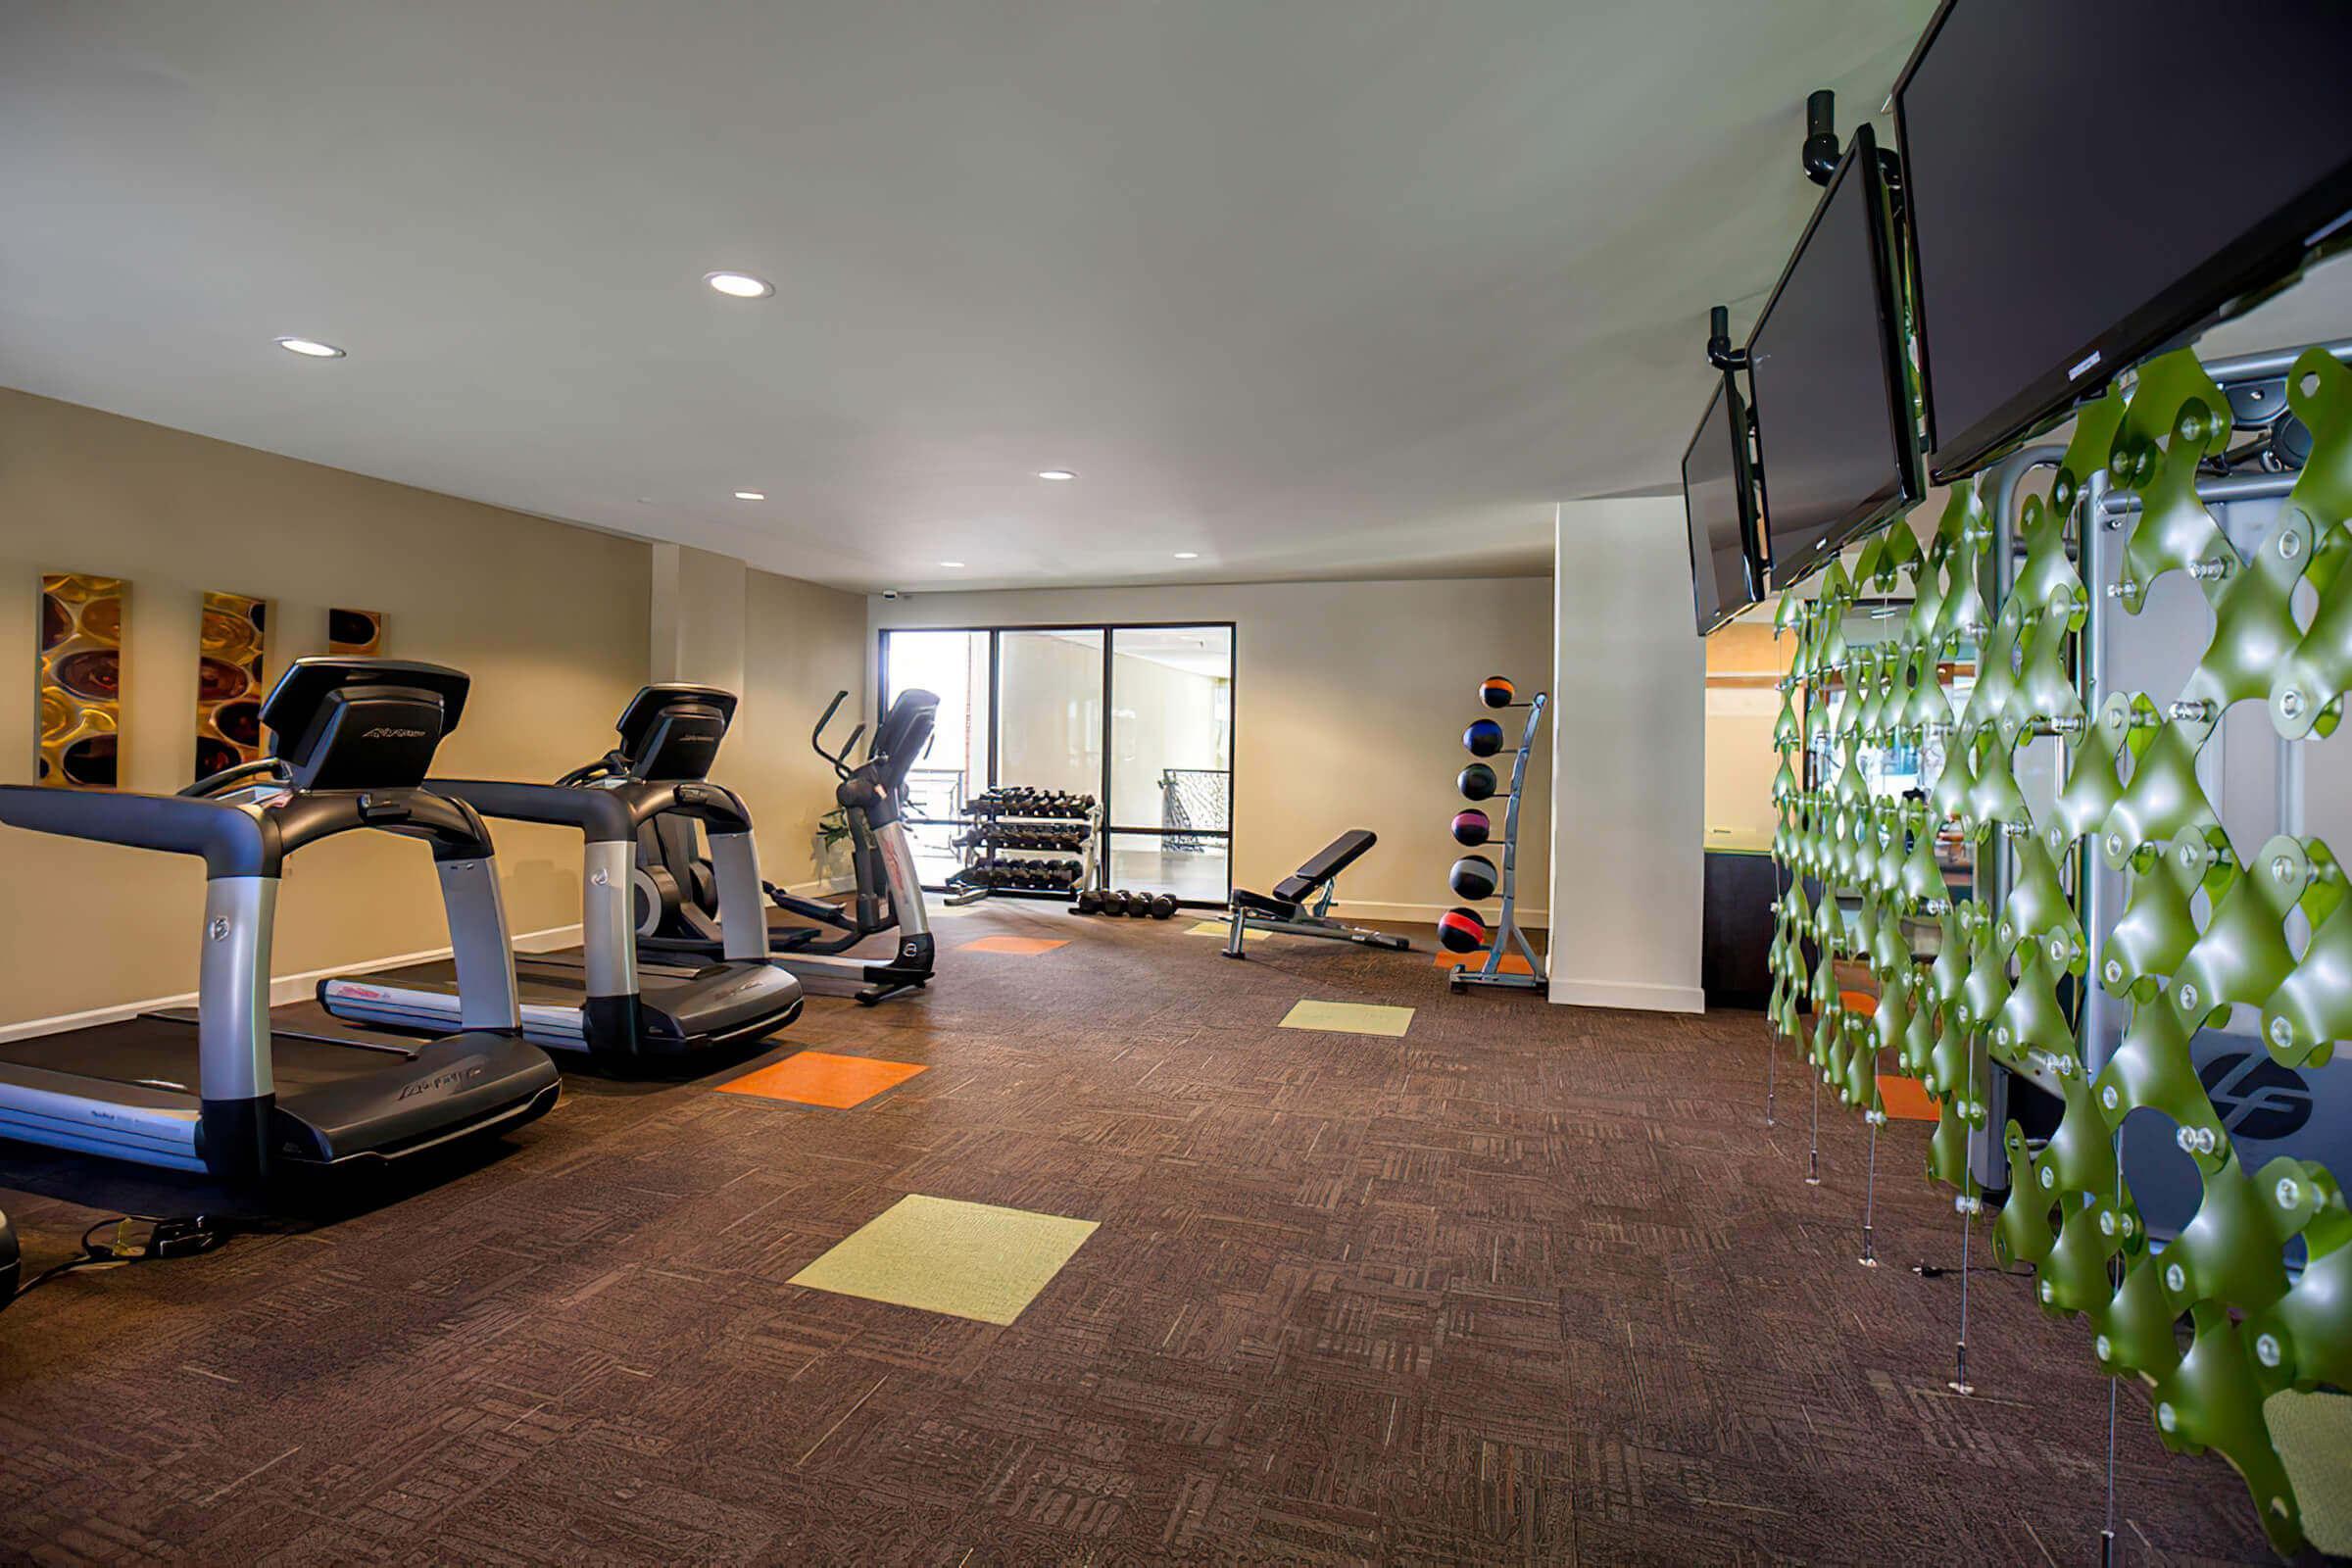 San Antigua Day 3 Fitness Center Angle 2-width-2400px.jpg